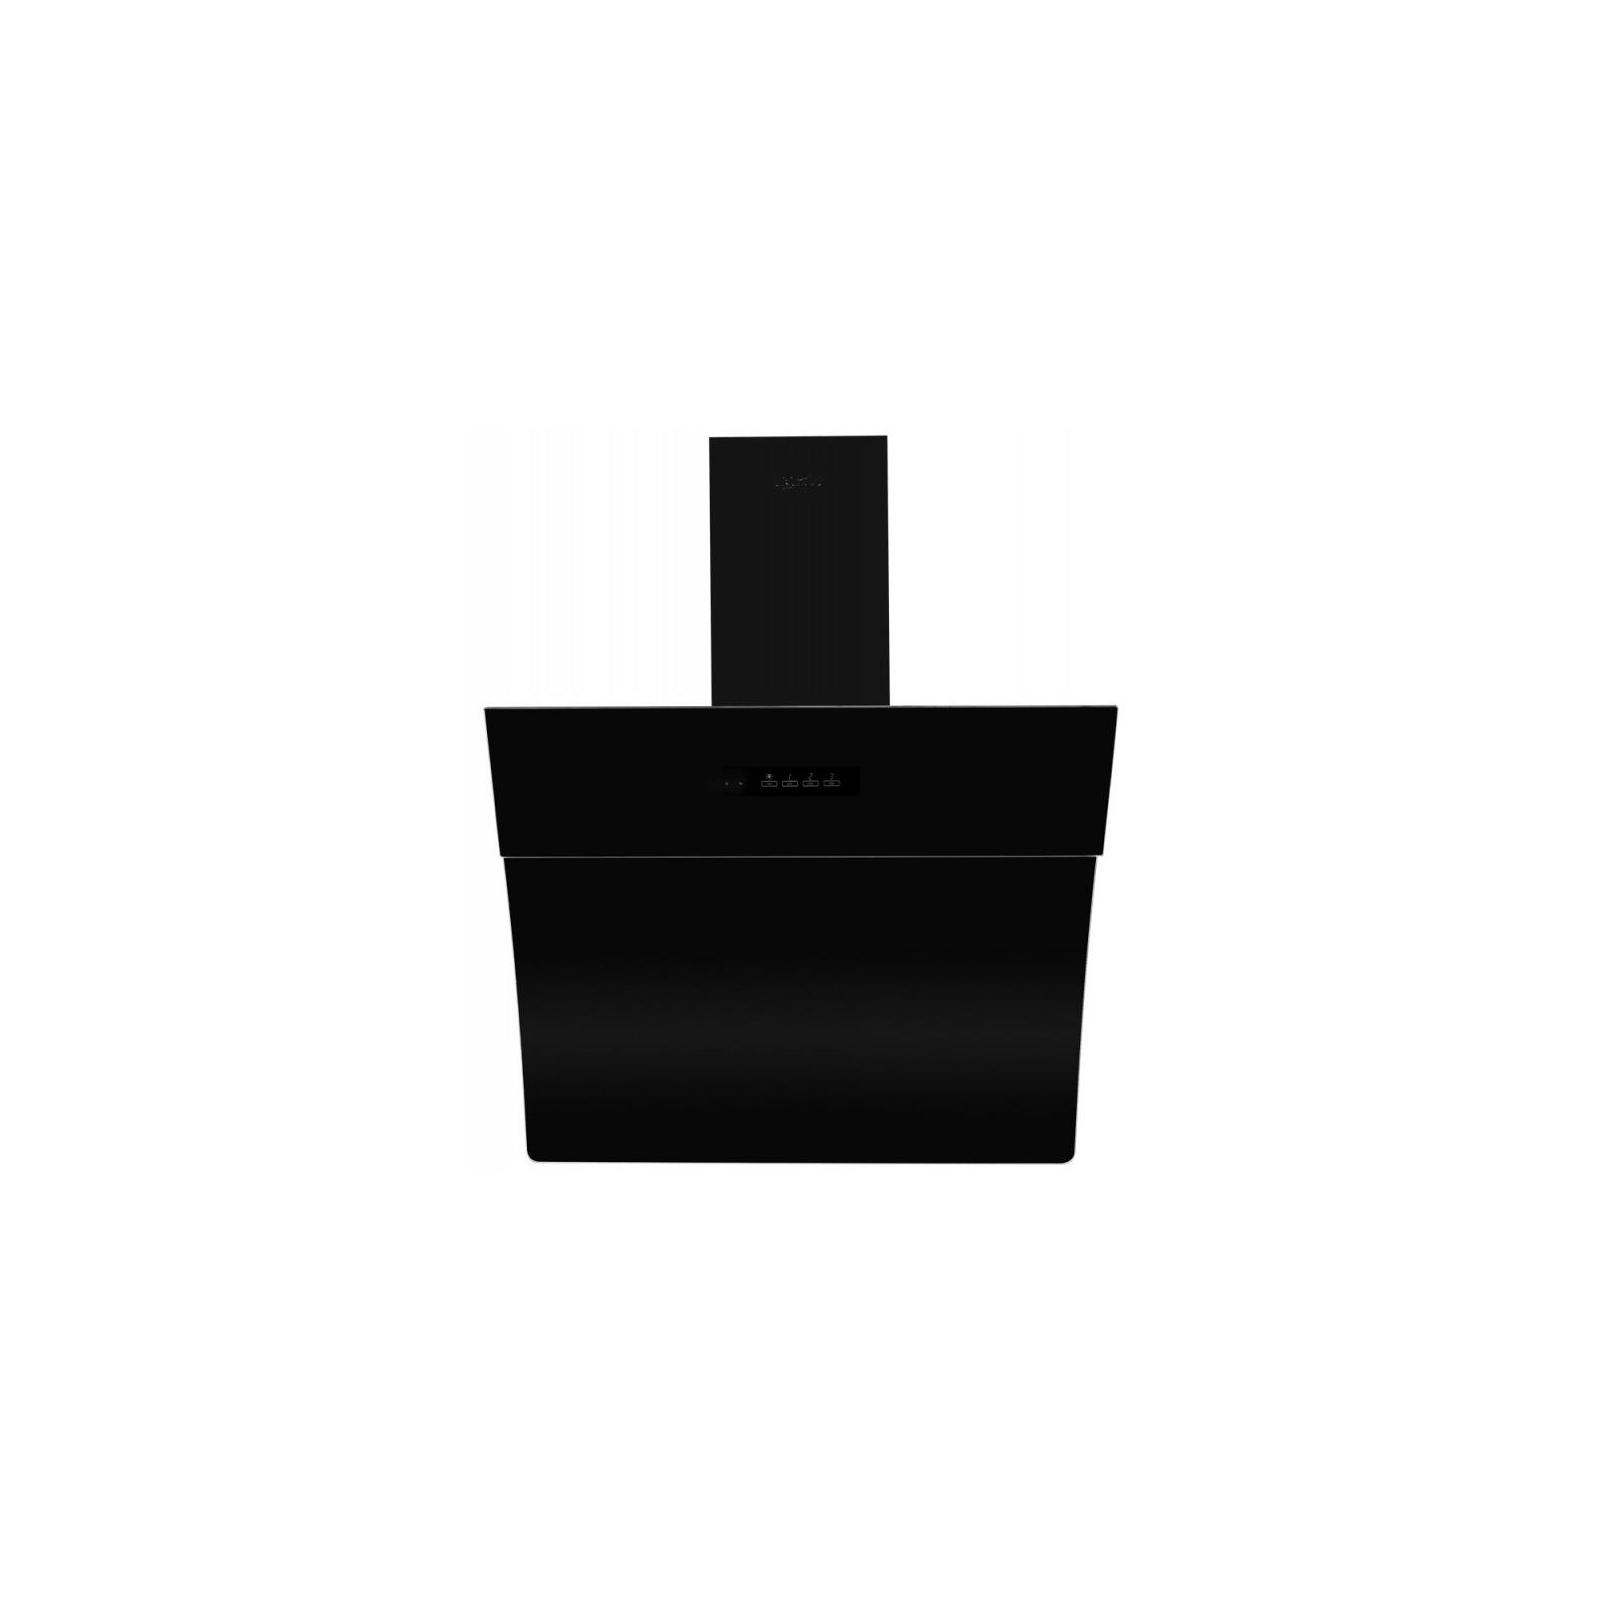 Вытяжка кухонная VENTOLUX FIRENZE 60 BK (1000) TRC IT SD